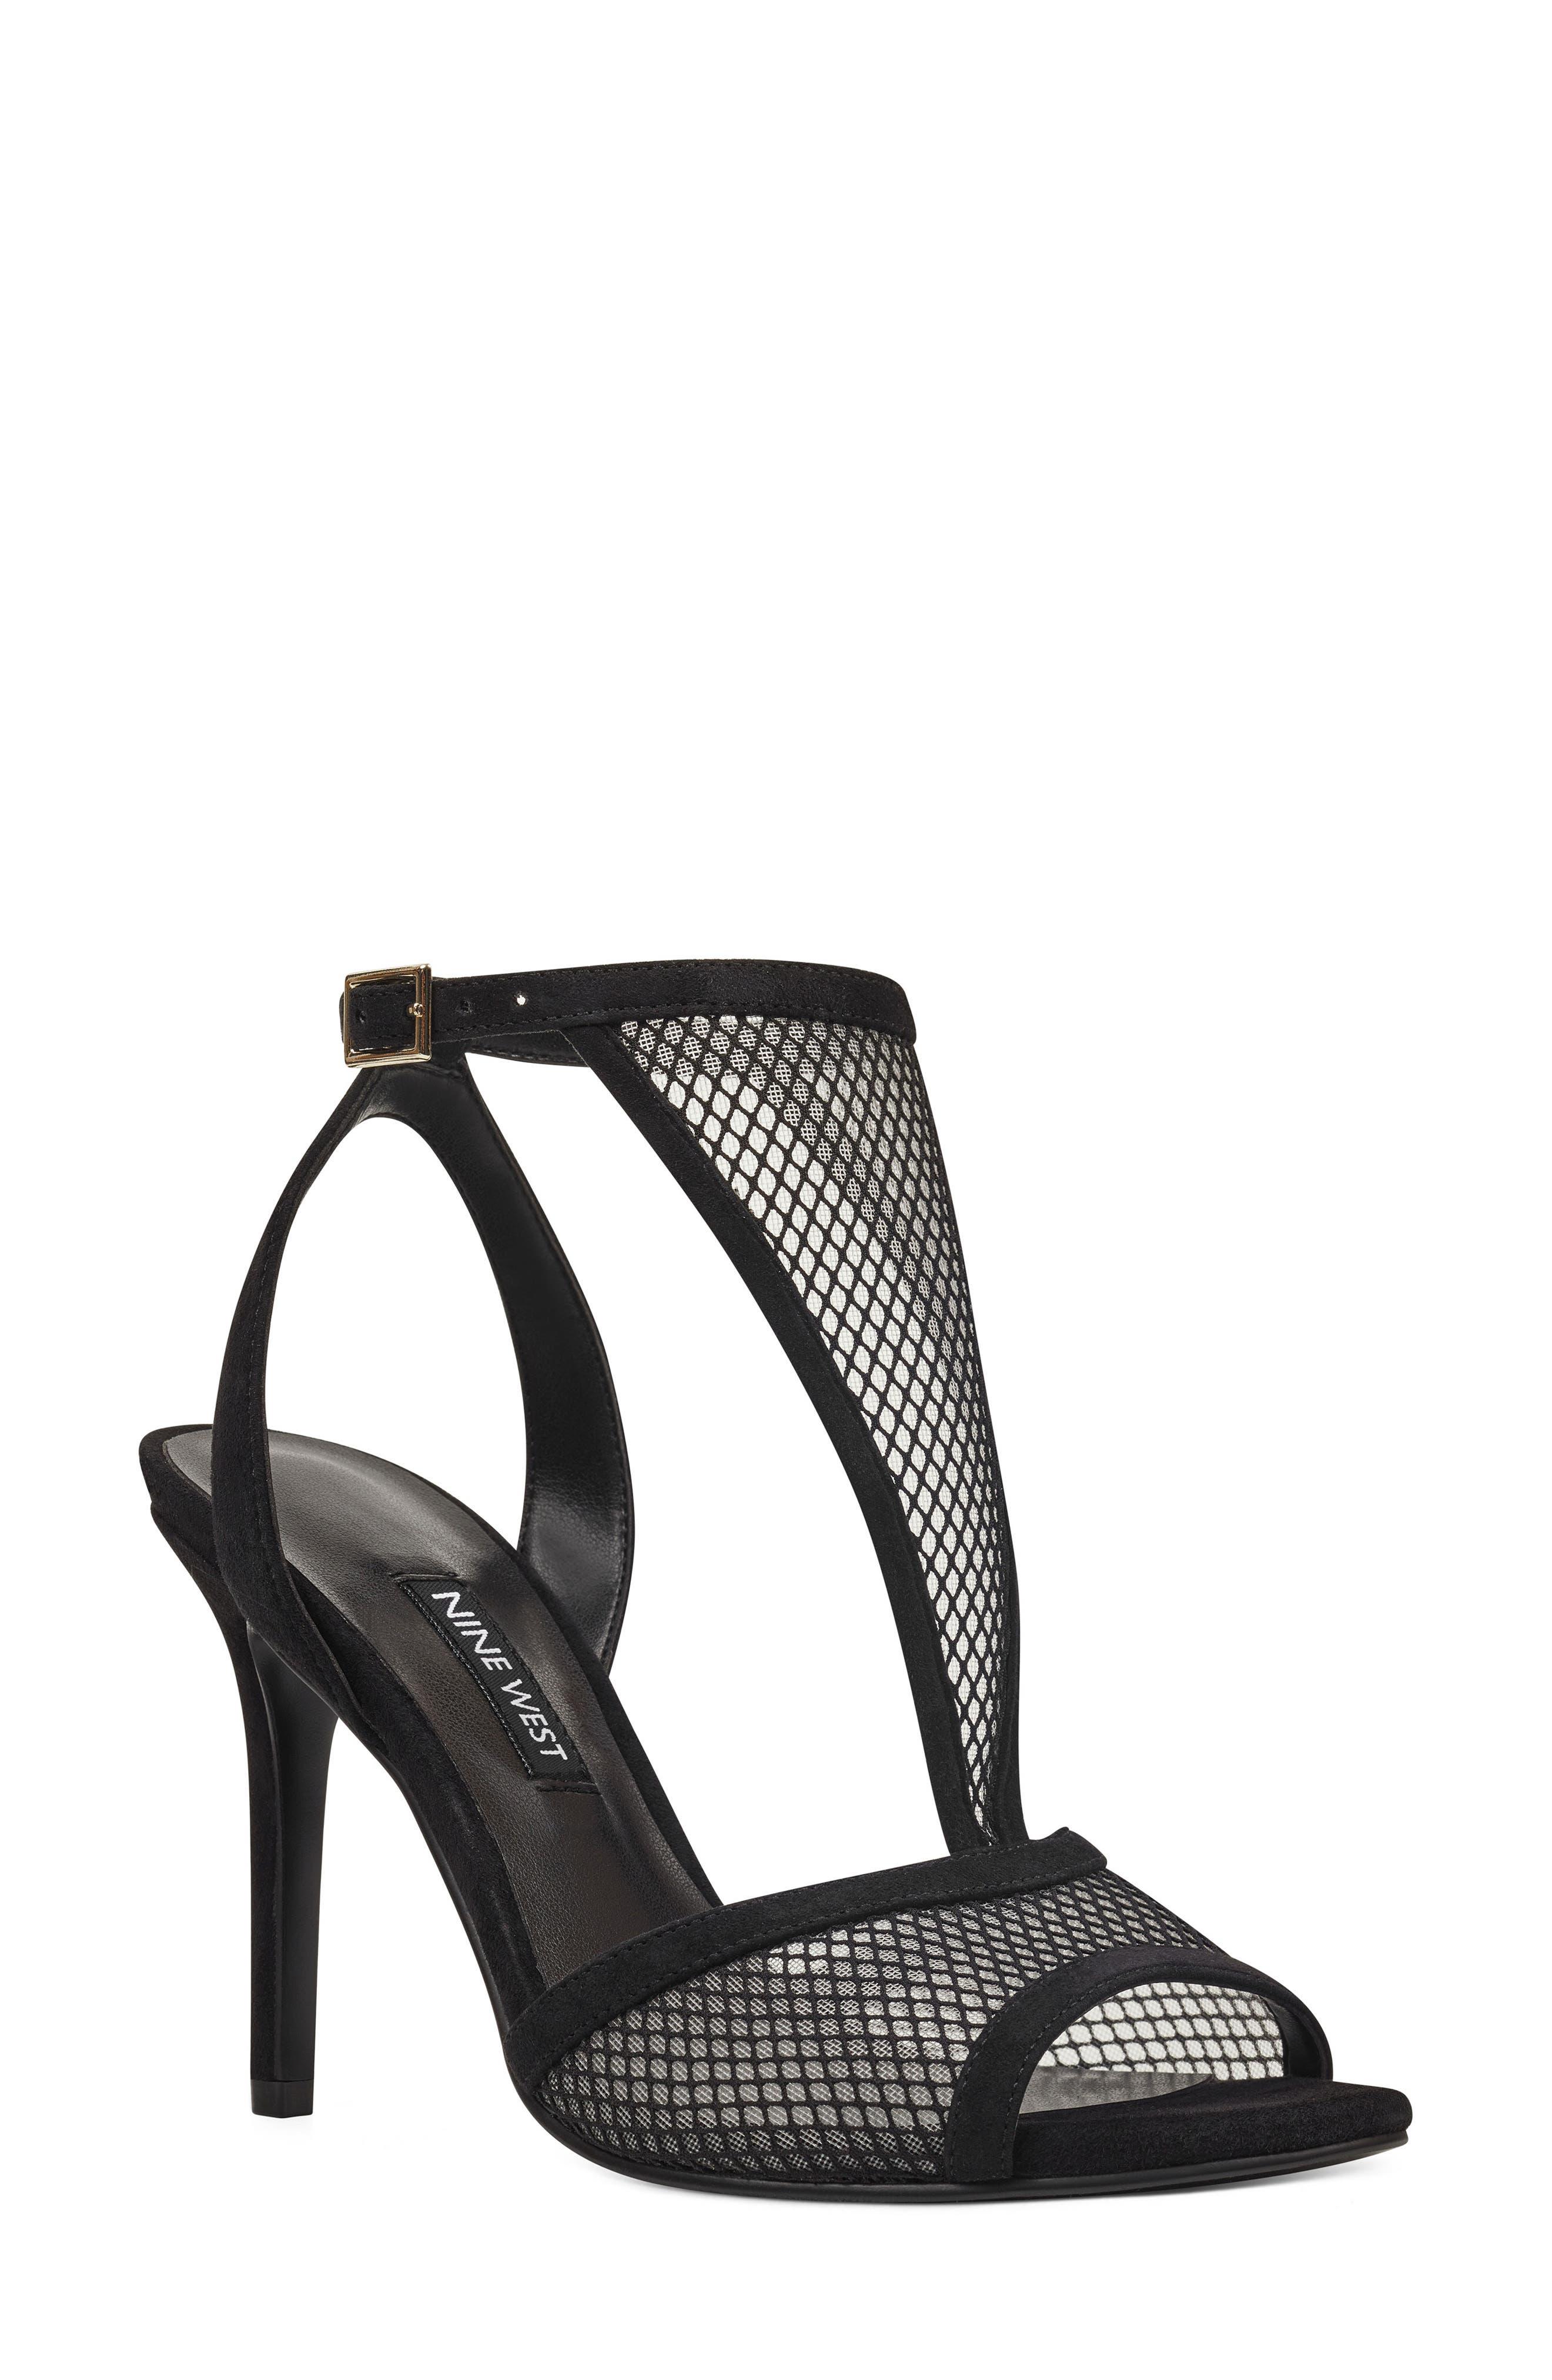 Manchon 2 Ankle Strap Sandal,                             Main thumbnail 1, color,                             BLACK STRETCH MESH/ LEATHER